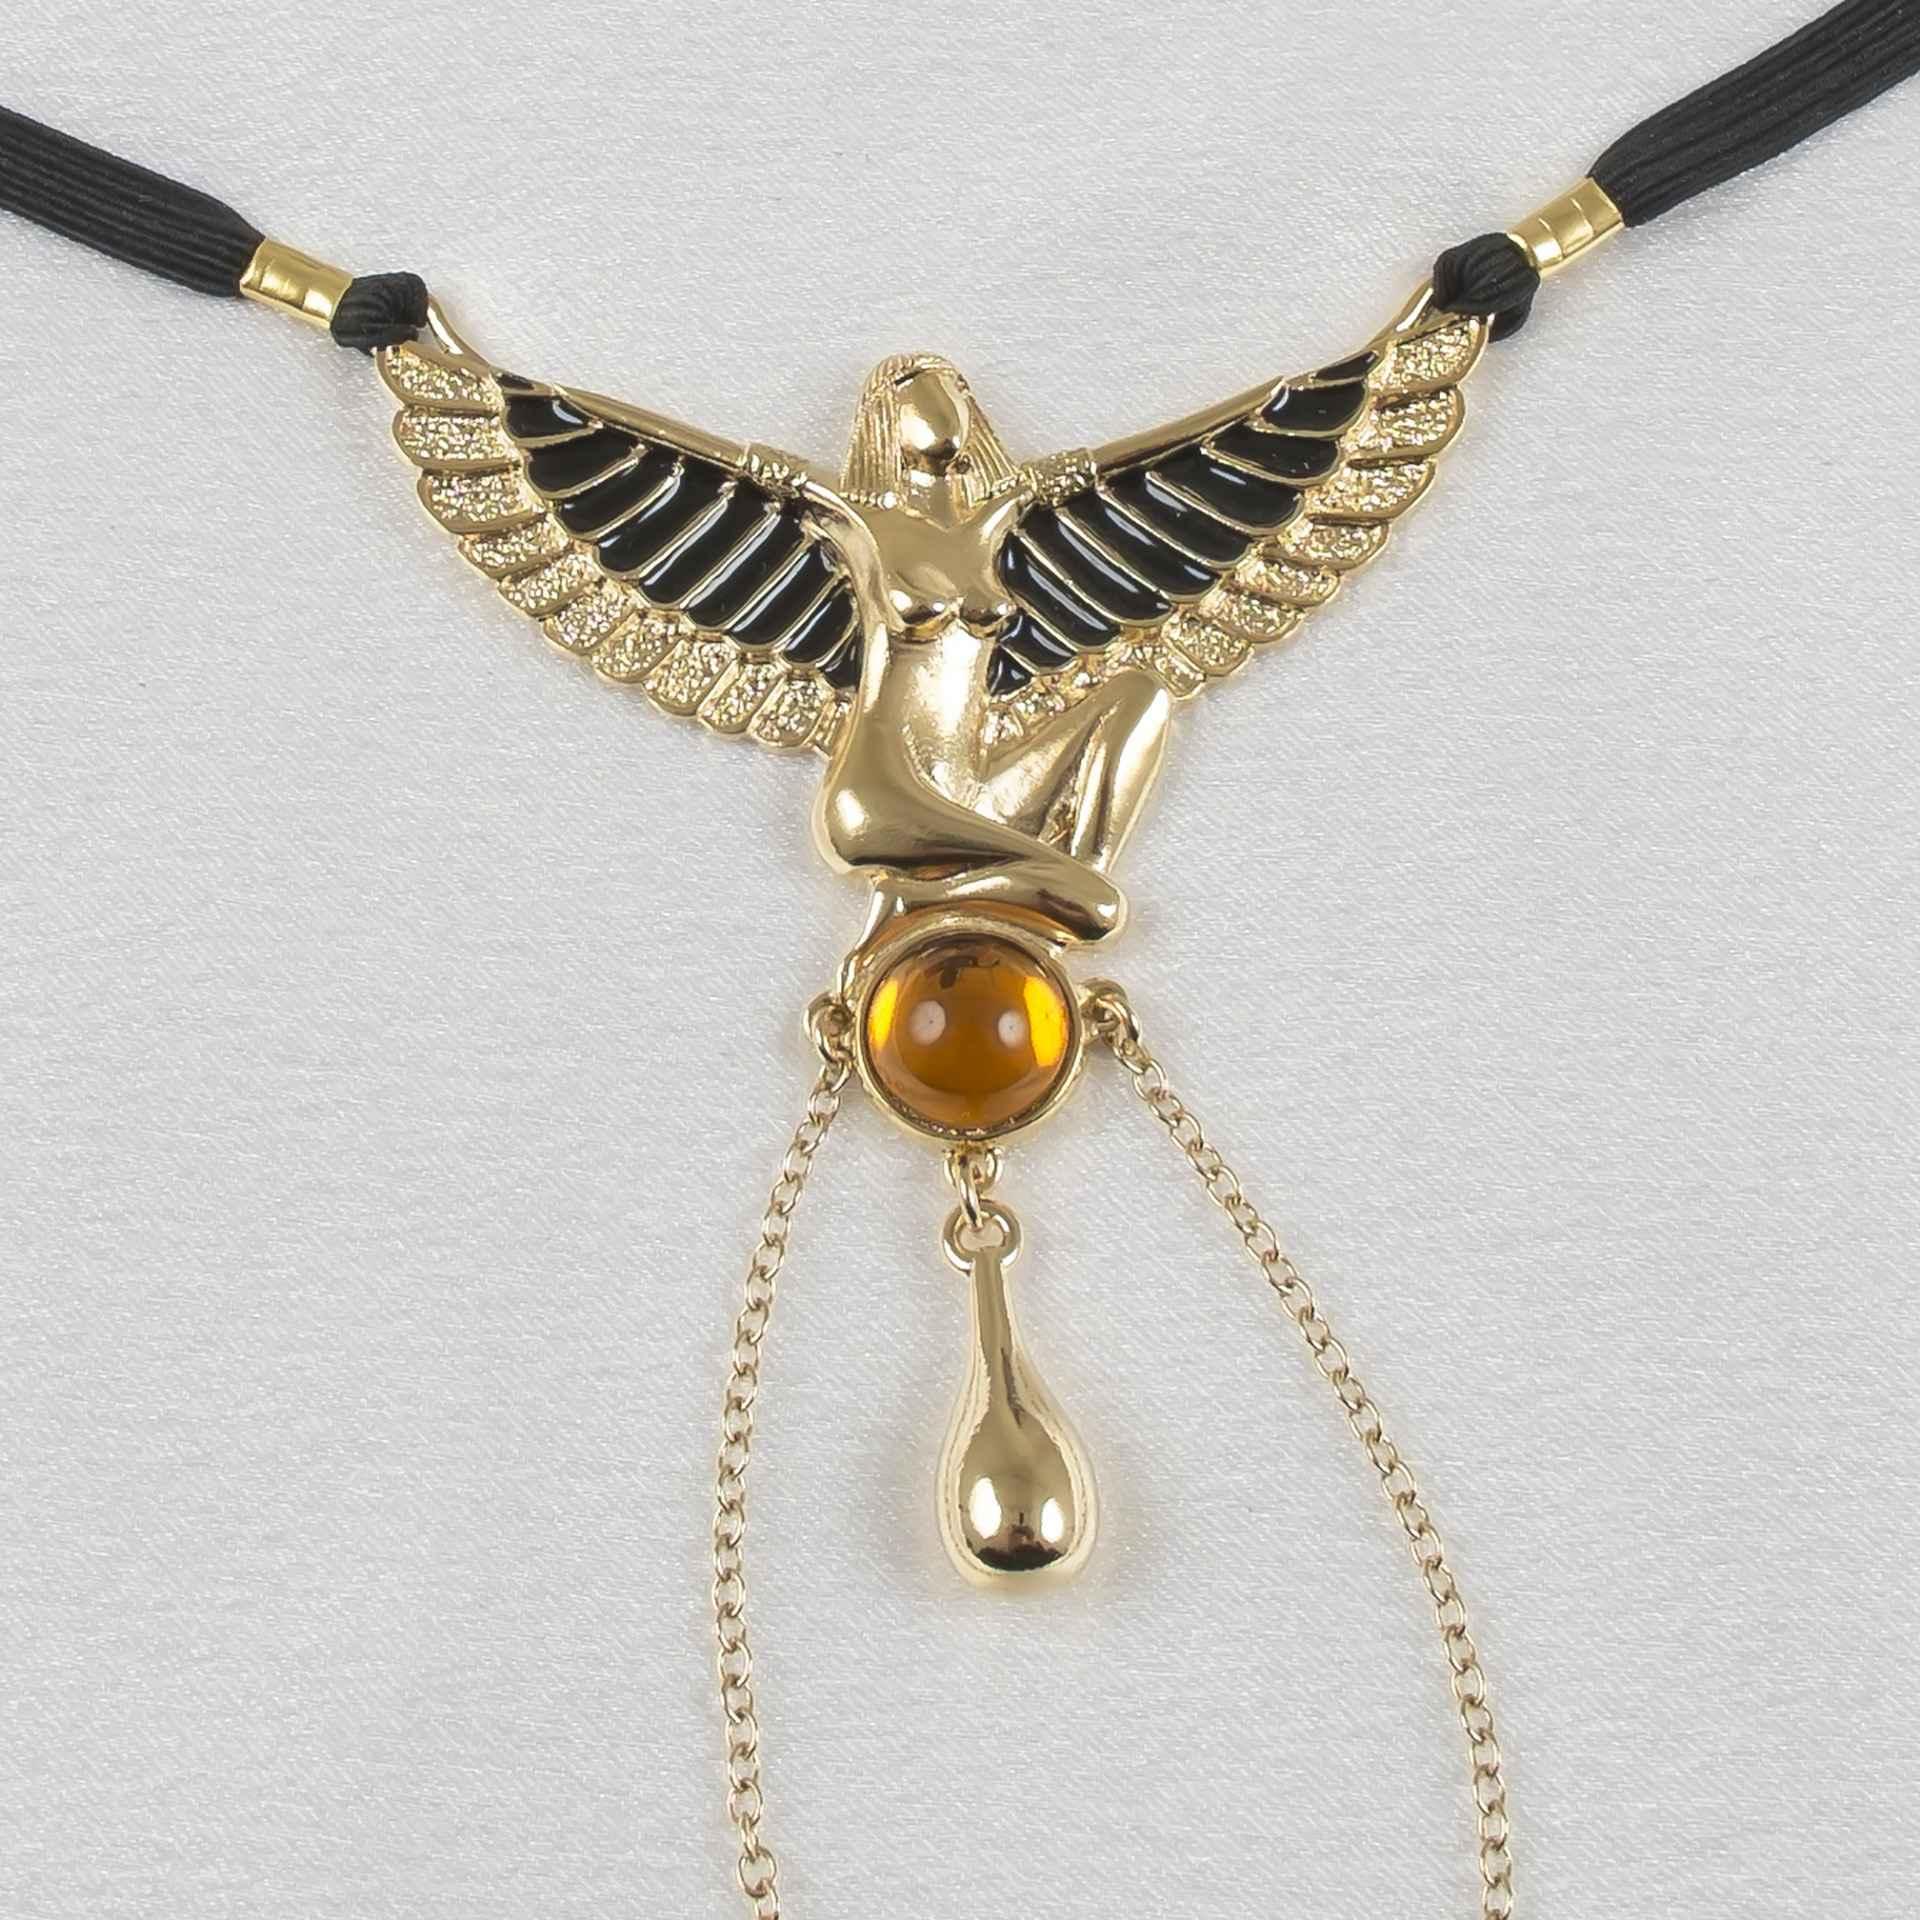 SDC Sylvie Monthule Erotic Clitoral Jewelry